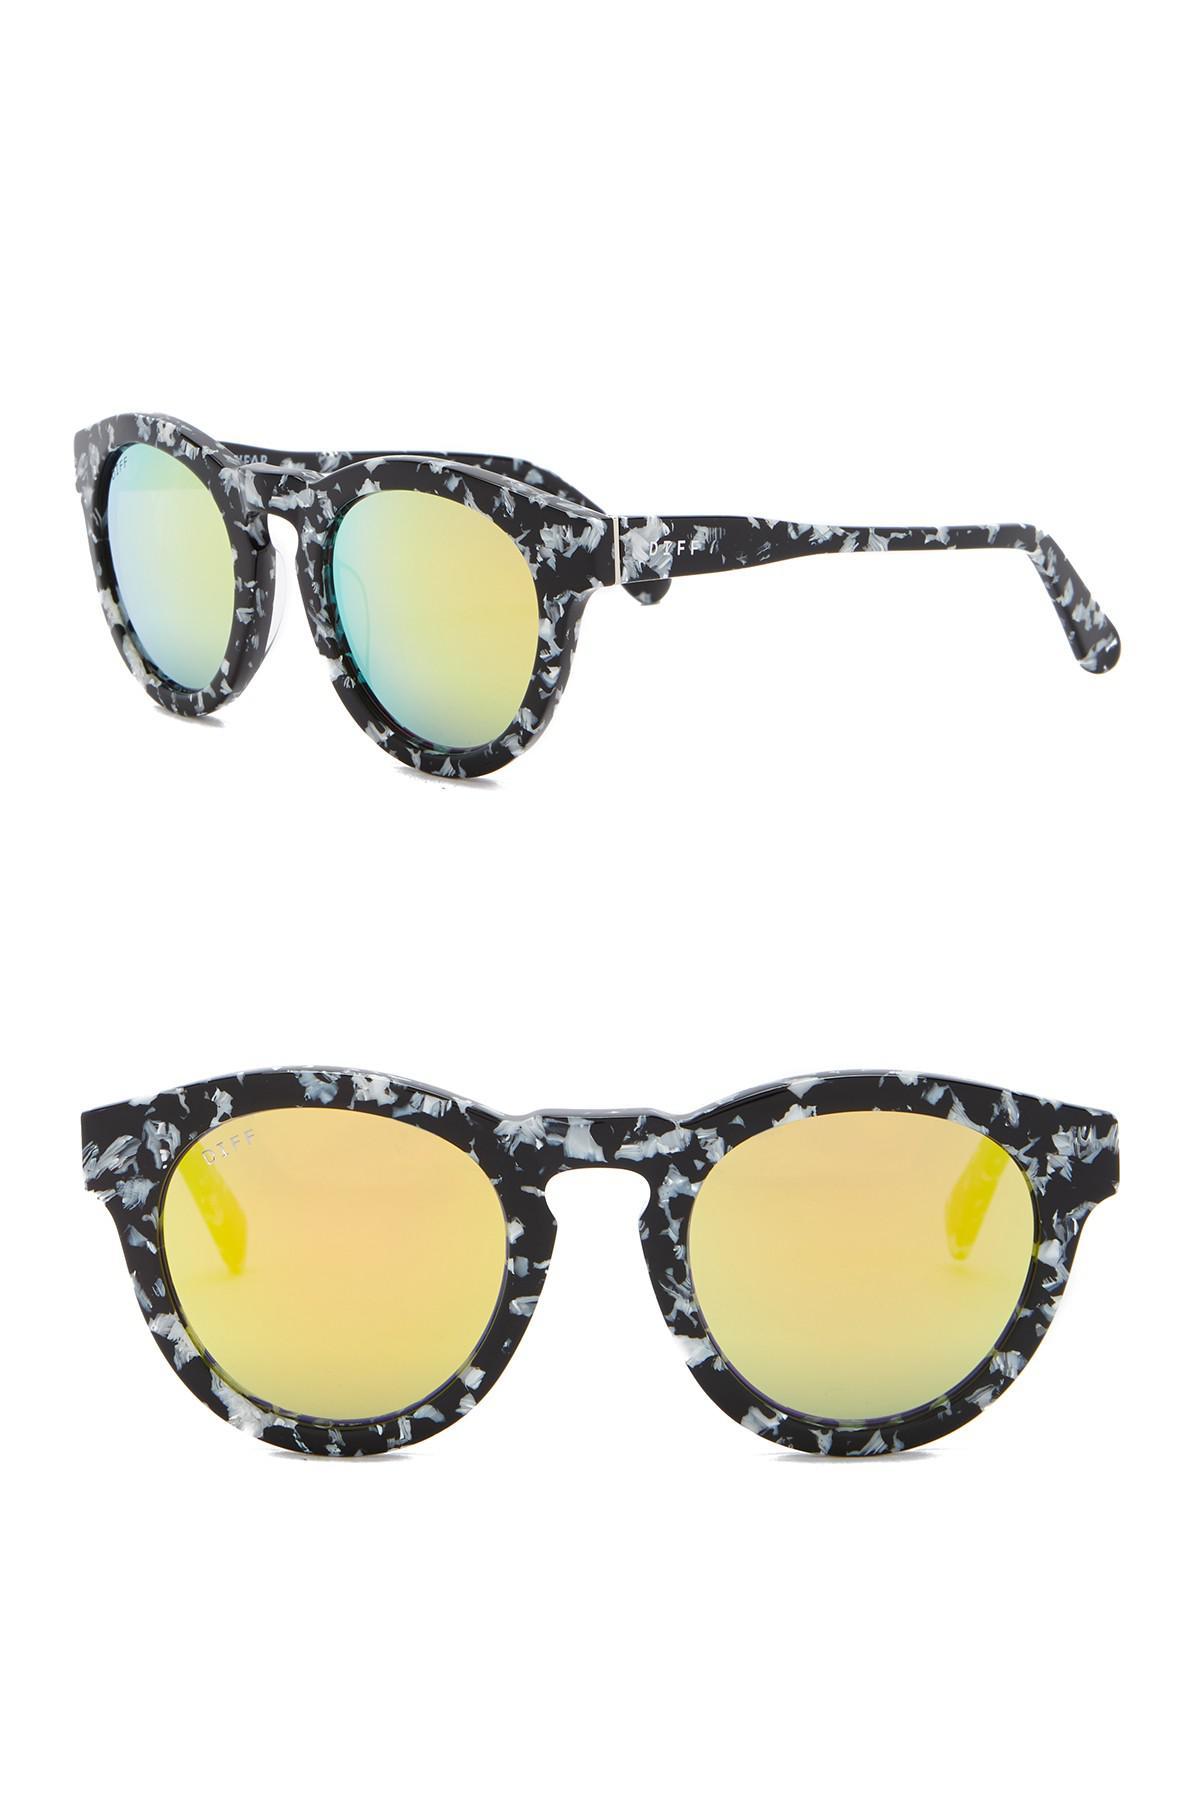 41f25eccb1 DIFF. Women s Dime Round Keyhole Bride 46mm Acetate Sunglasses